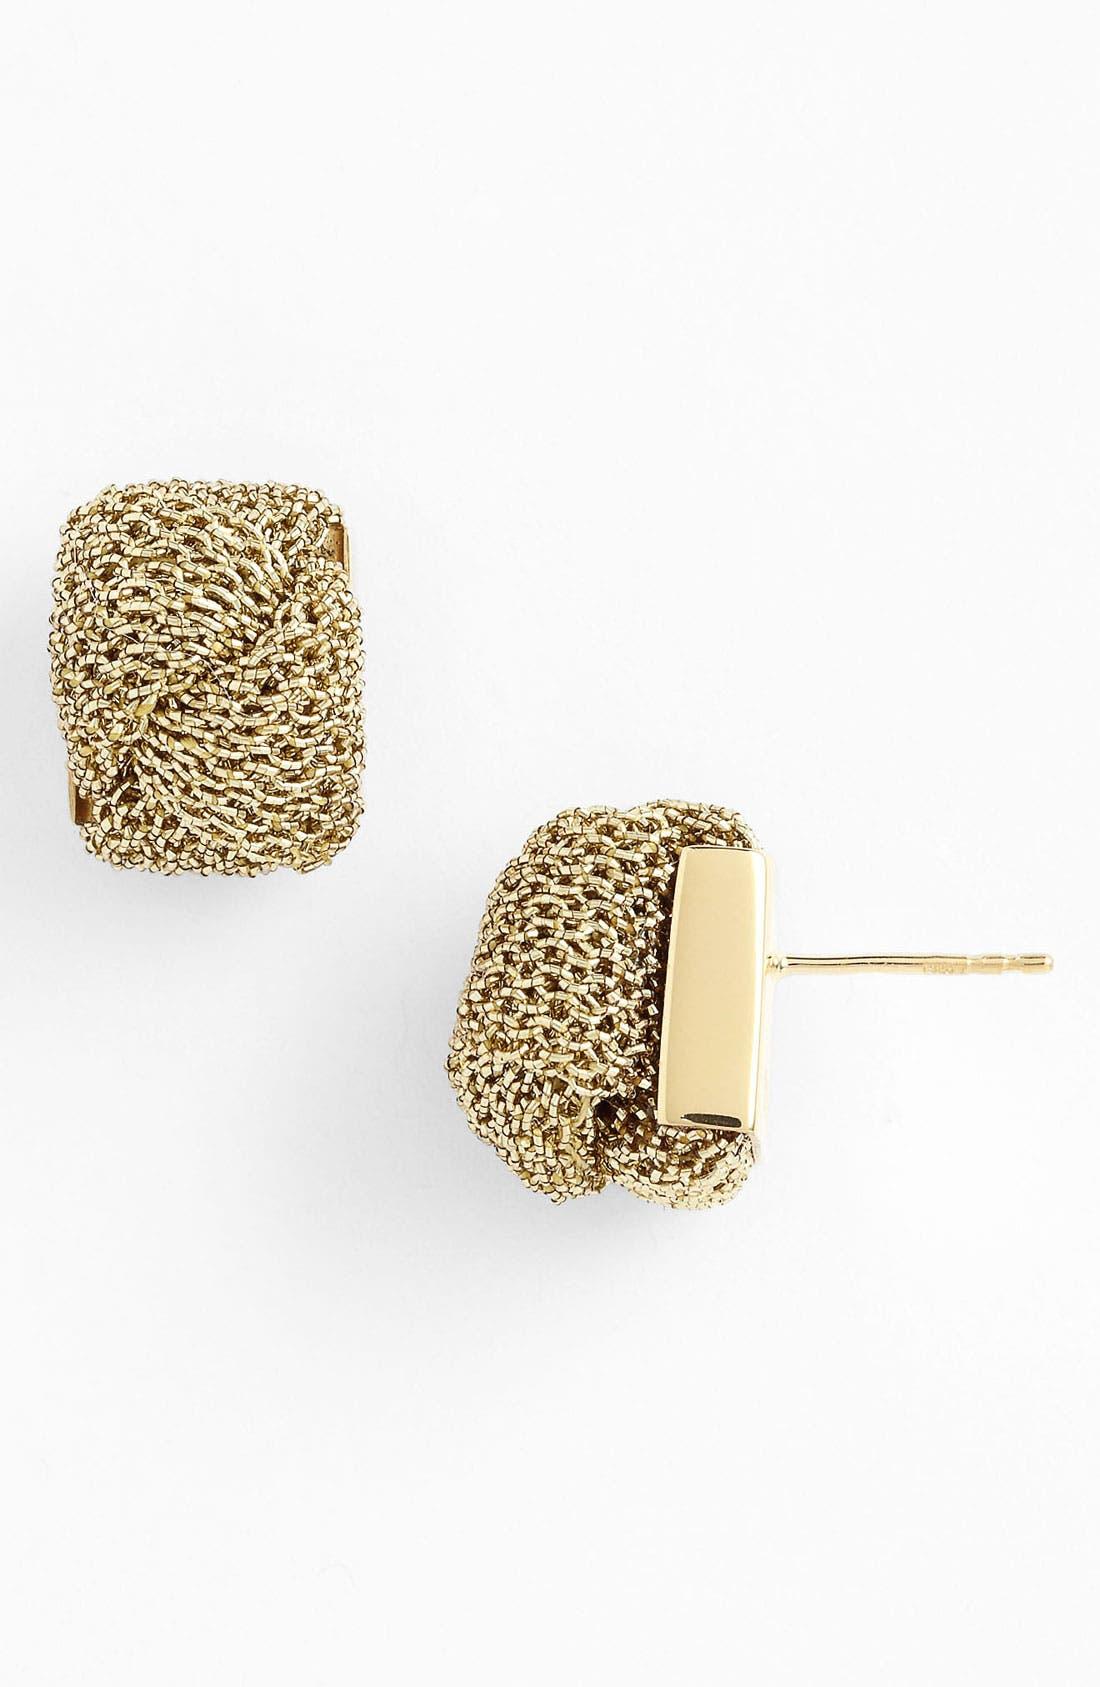 Alternate Image 1 Selected - Adami & Martucci 'Mesh' Stud Earrings